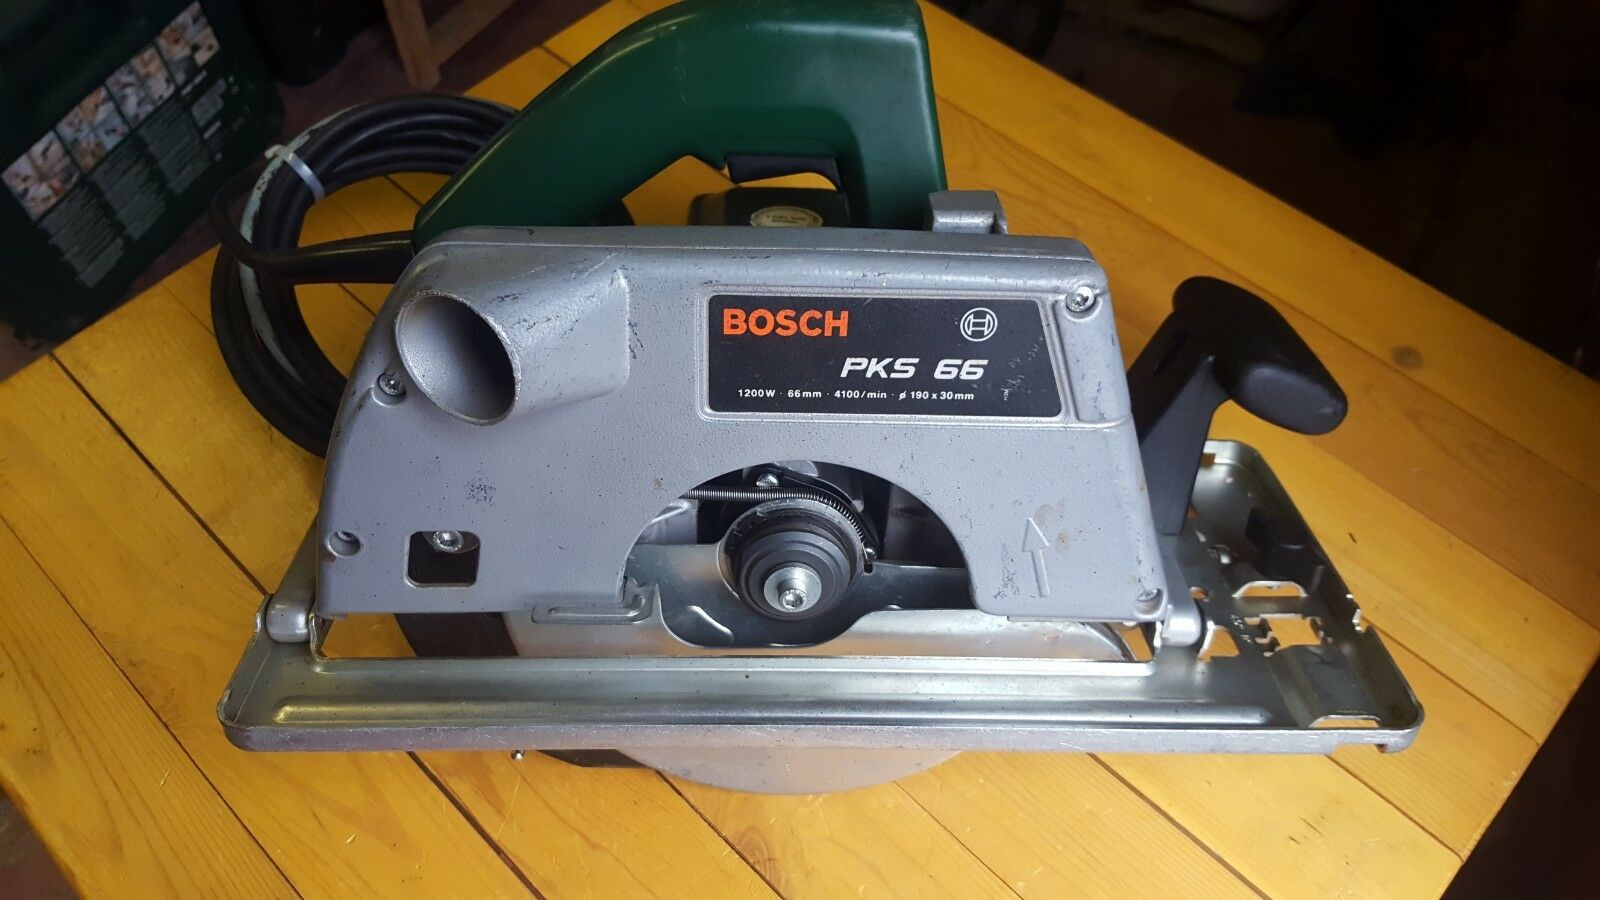 Bosch PKS 66 Kreissäge Handkreissäge